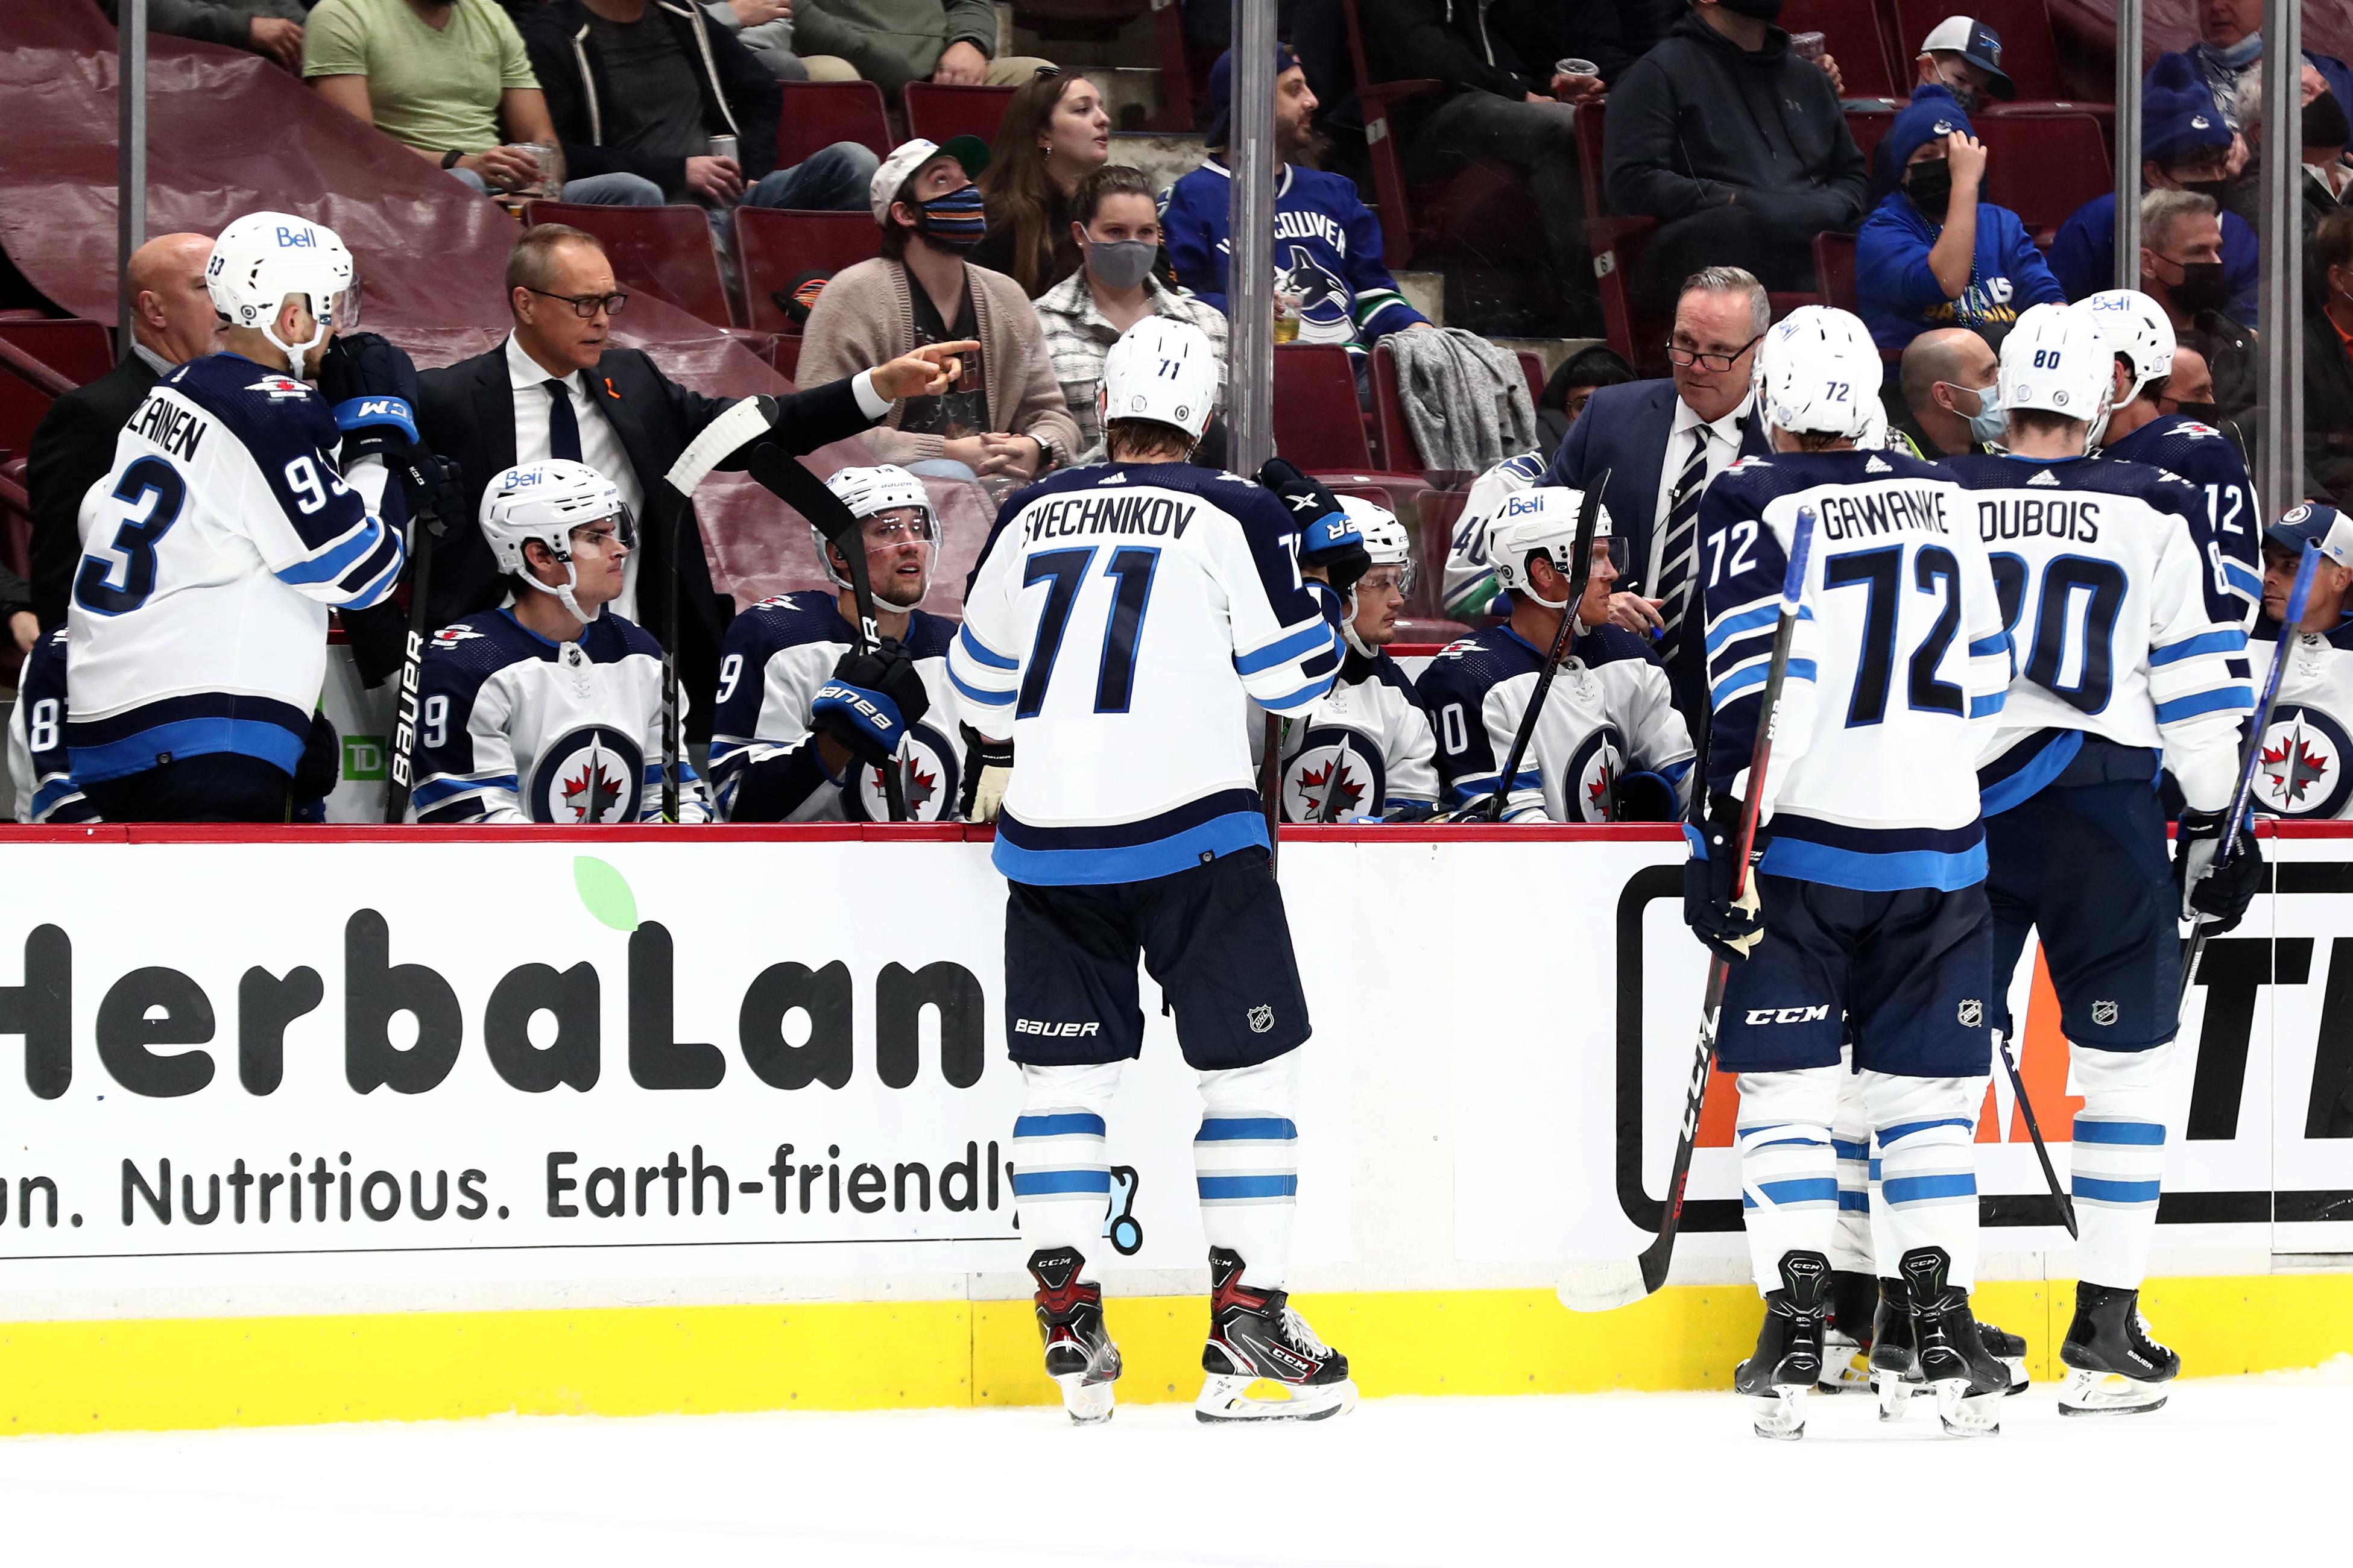 NHL: OCT 03 Preseason - Jets at Canucks